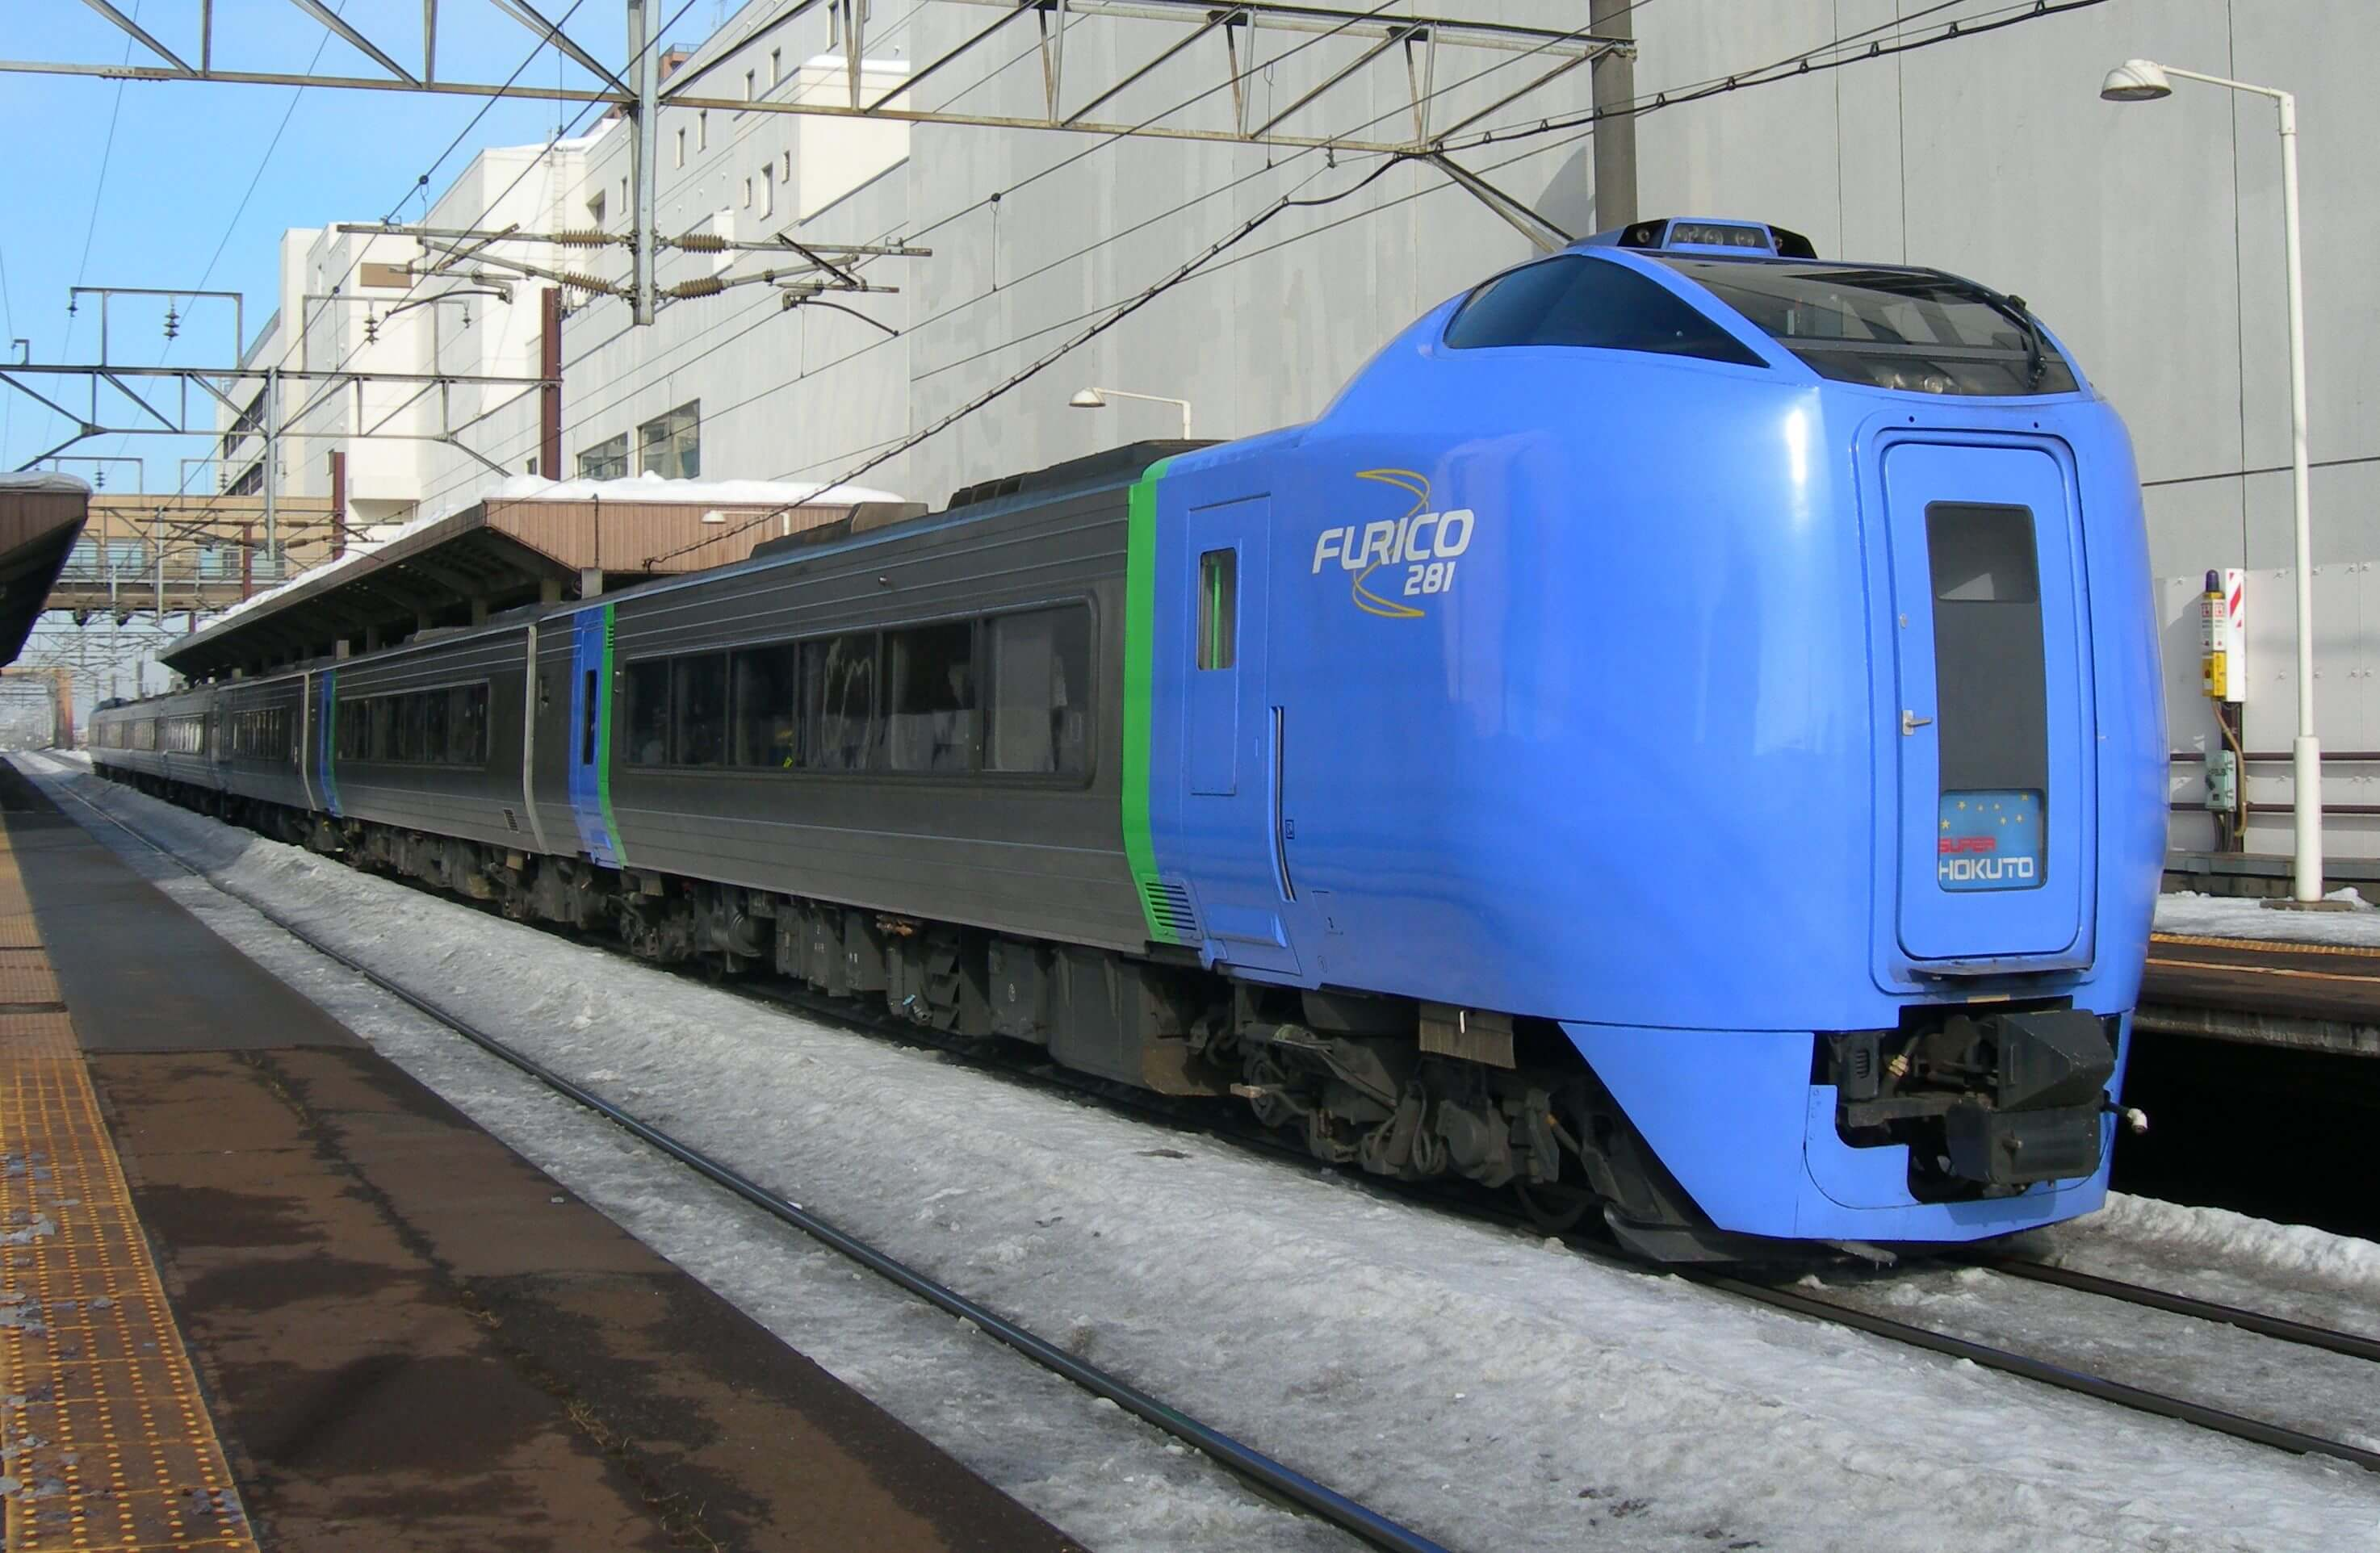 JRH kiha281 Limited express Super Hokuto - JR北海道 秋の臨時列車まとめ